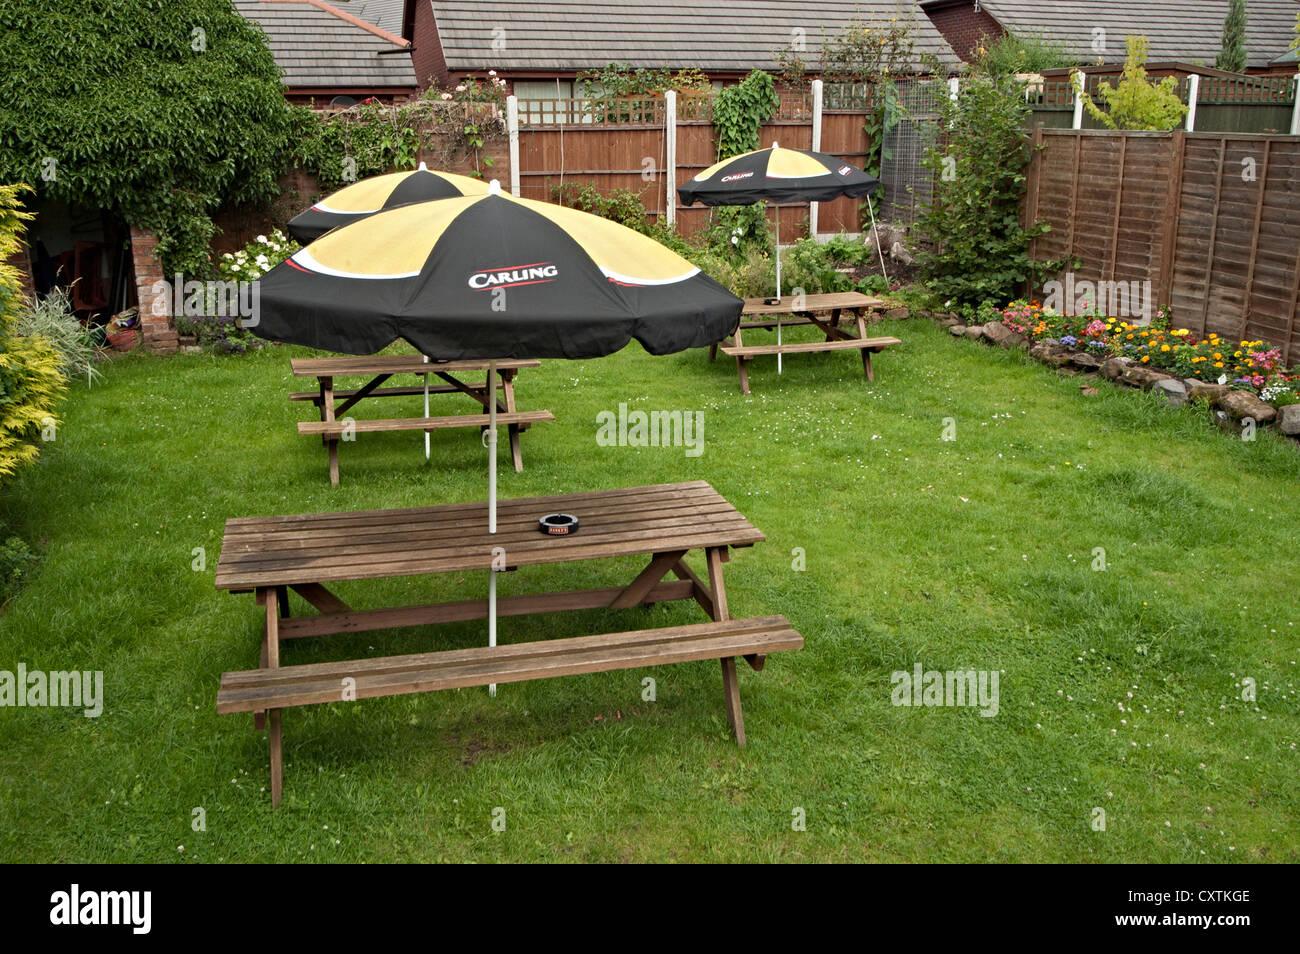 Astonishing The Sunriser Pub Garden Bench Stock Photo 50943998 Alamy Dailytribune Chair Design For Home Dailytribuneorg